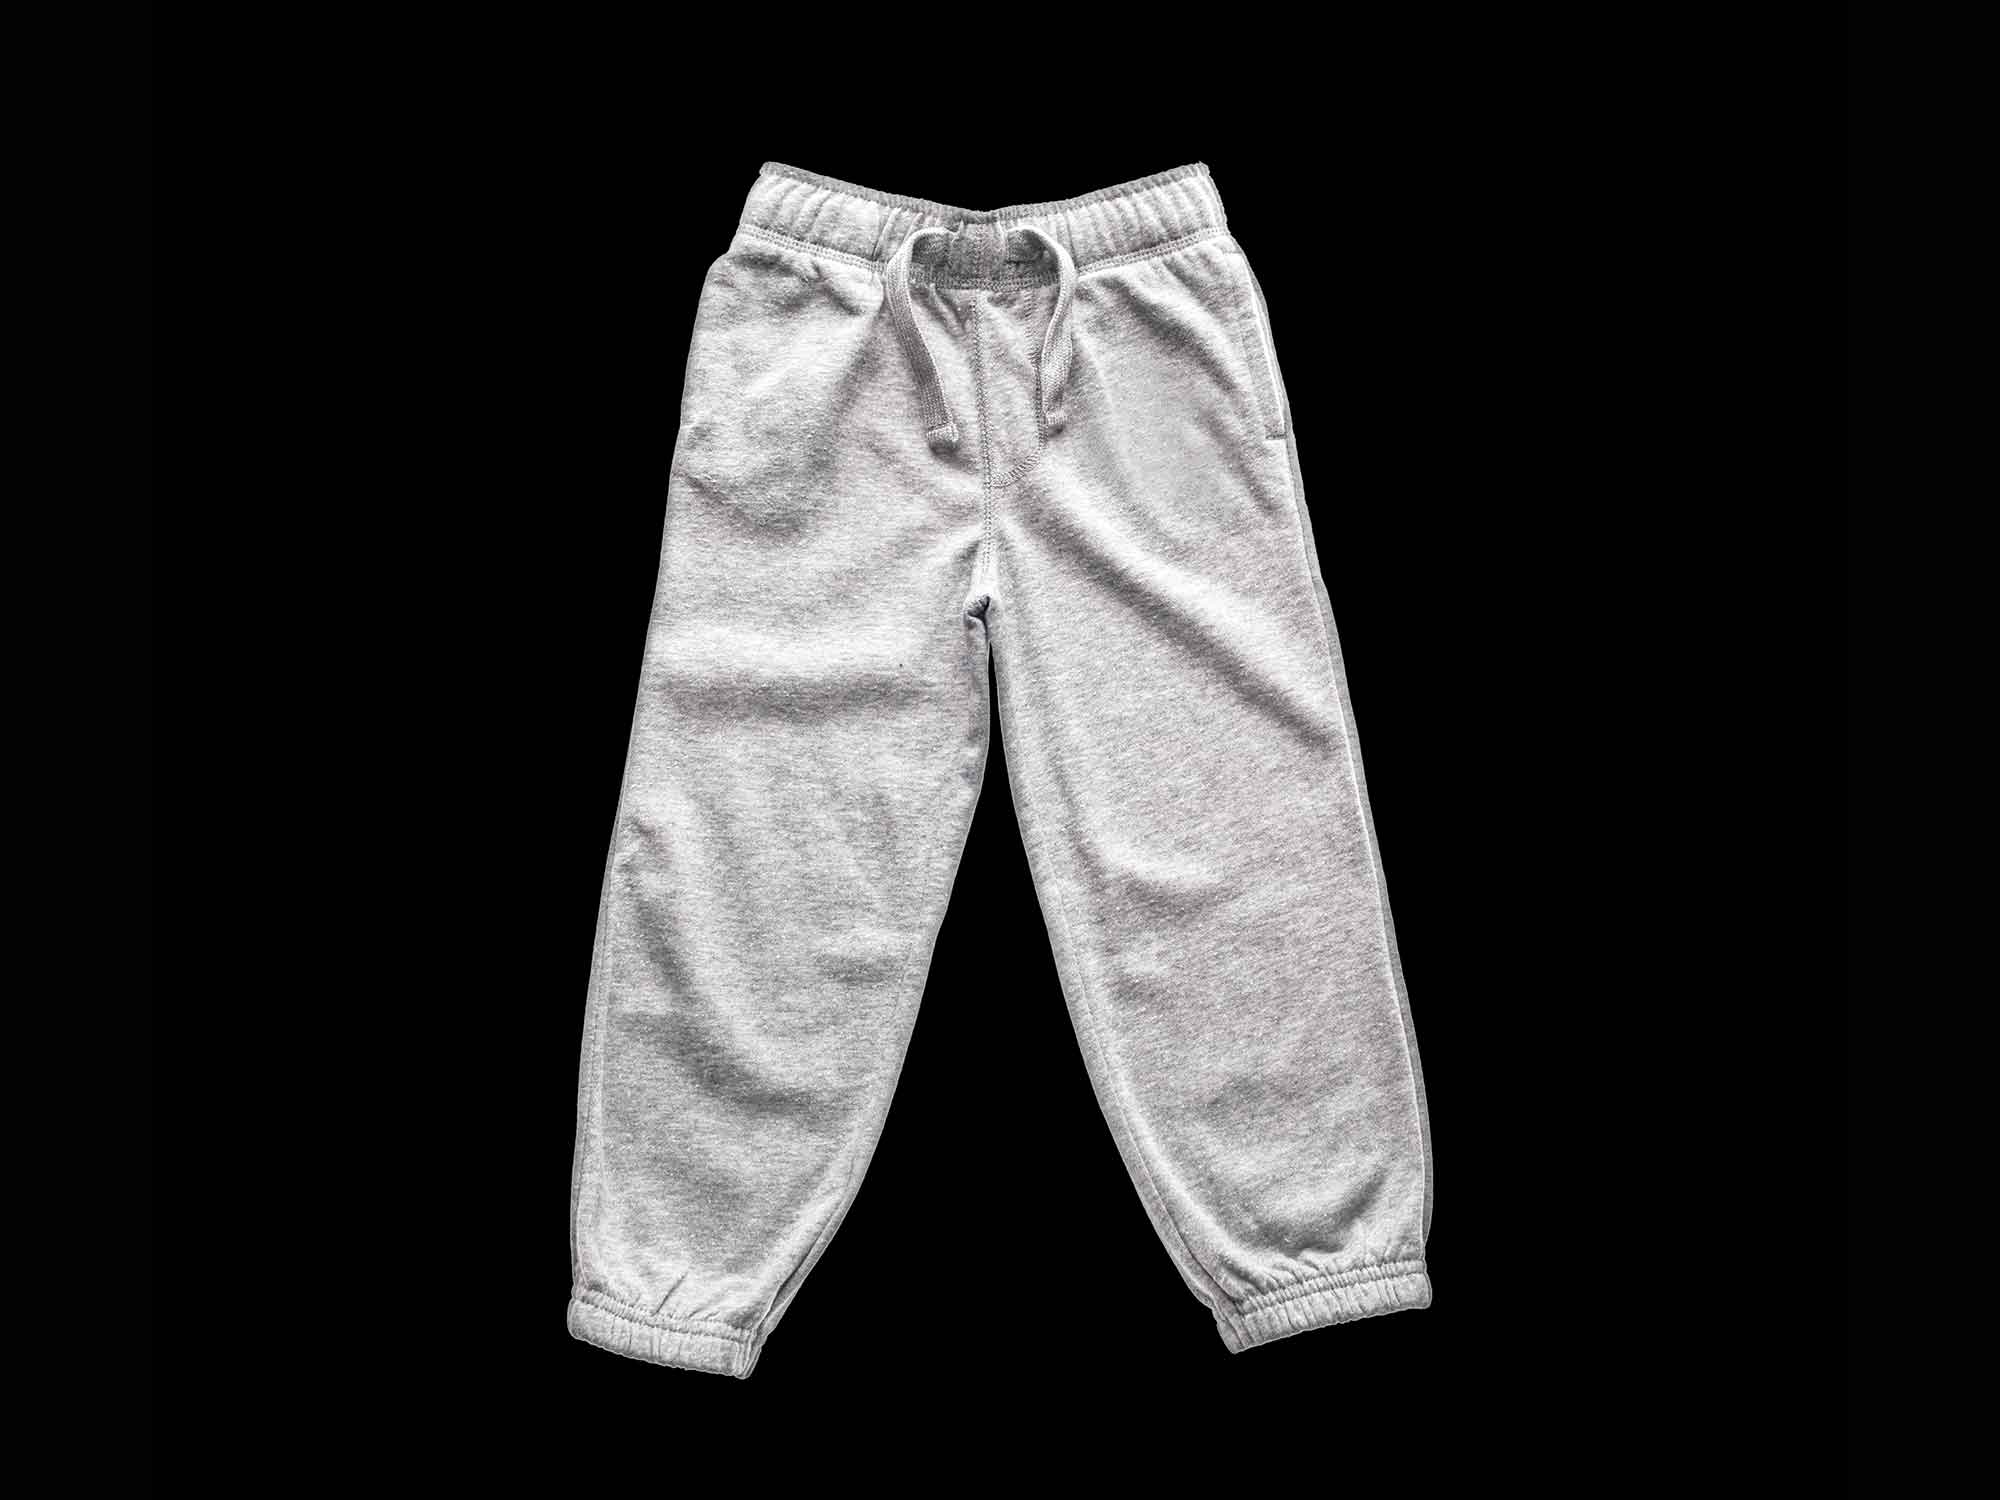 Sweatpants Mockup 2